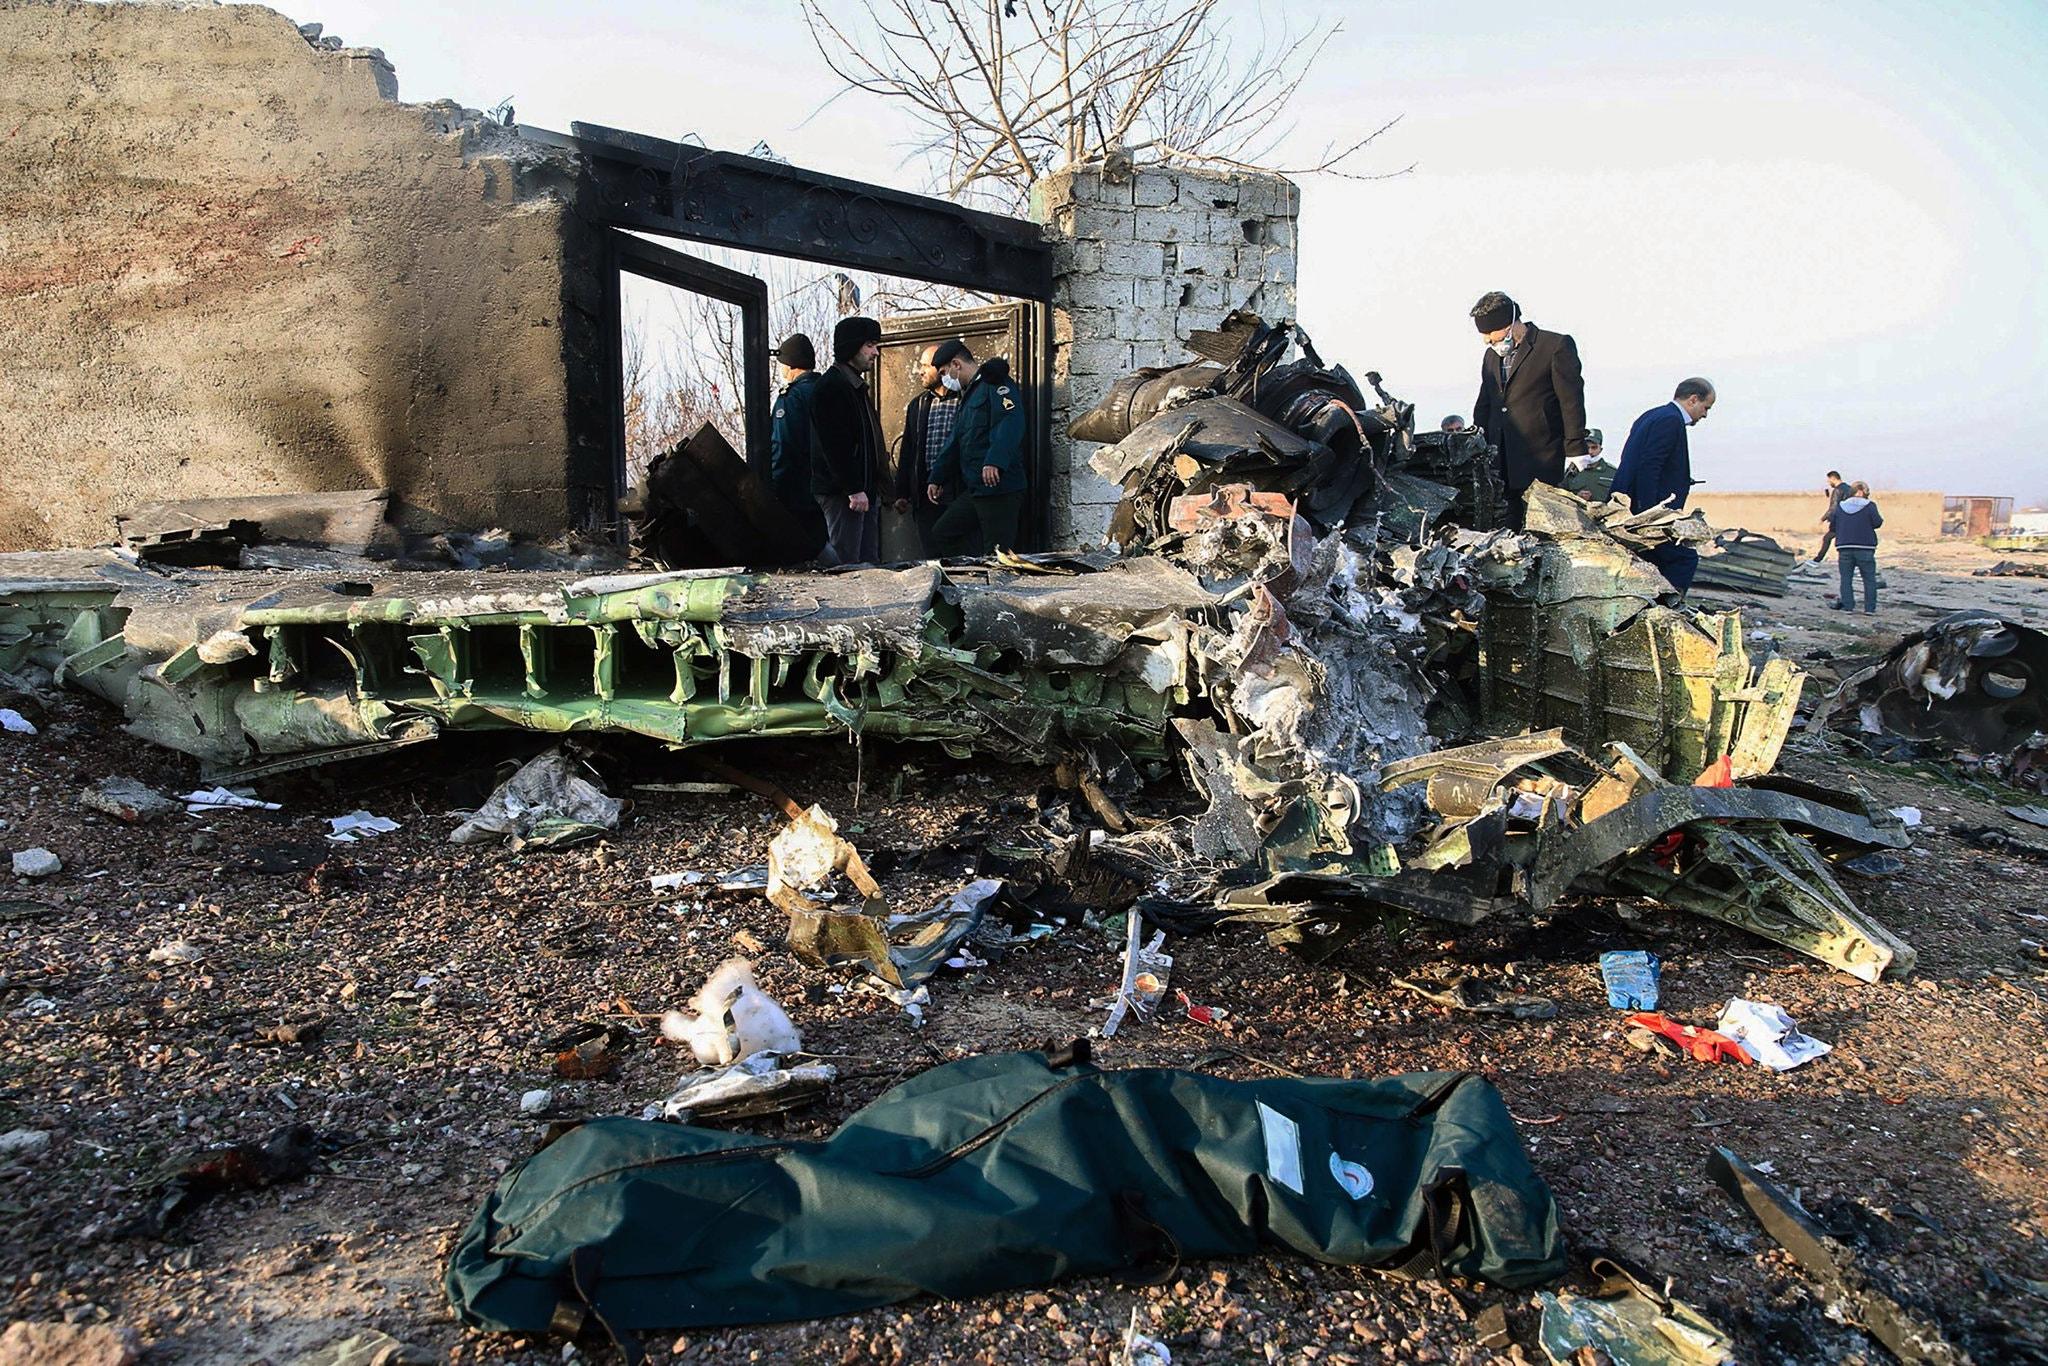 Plance crash in Iran